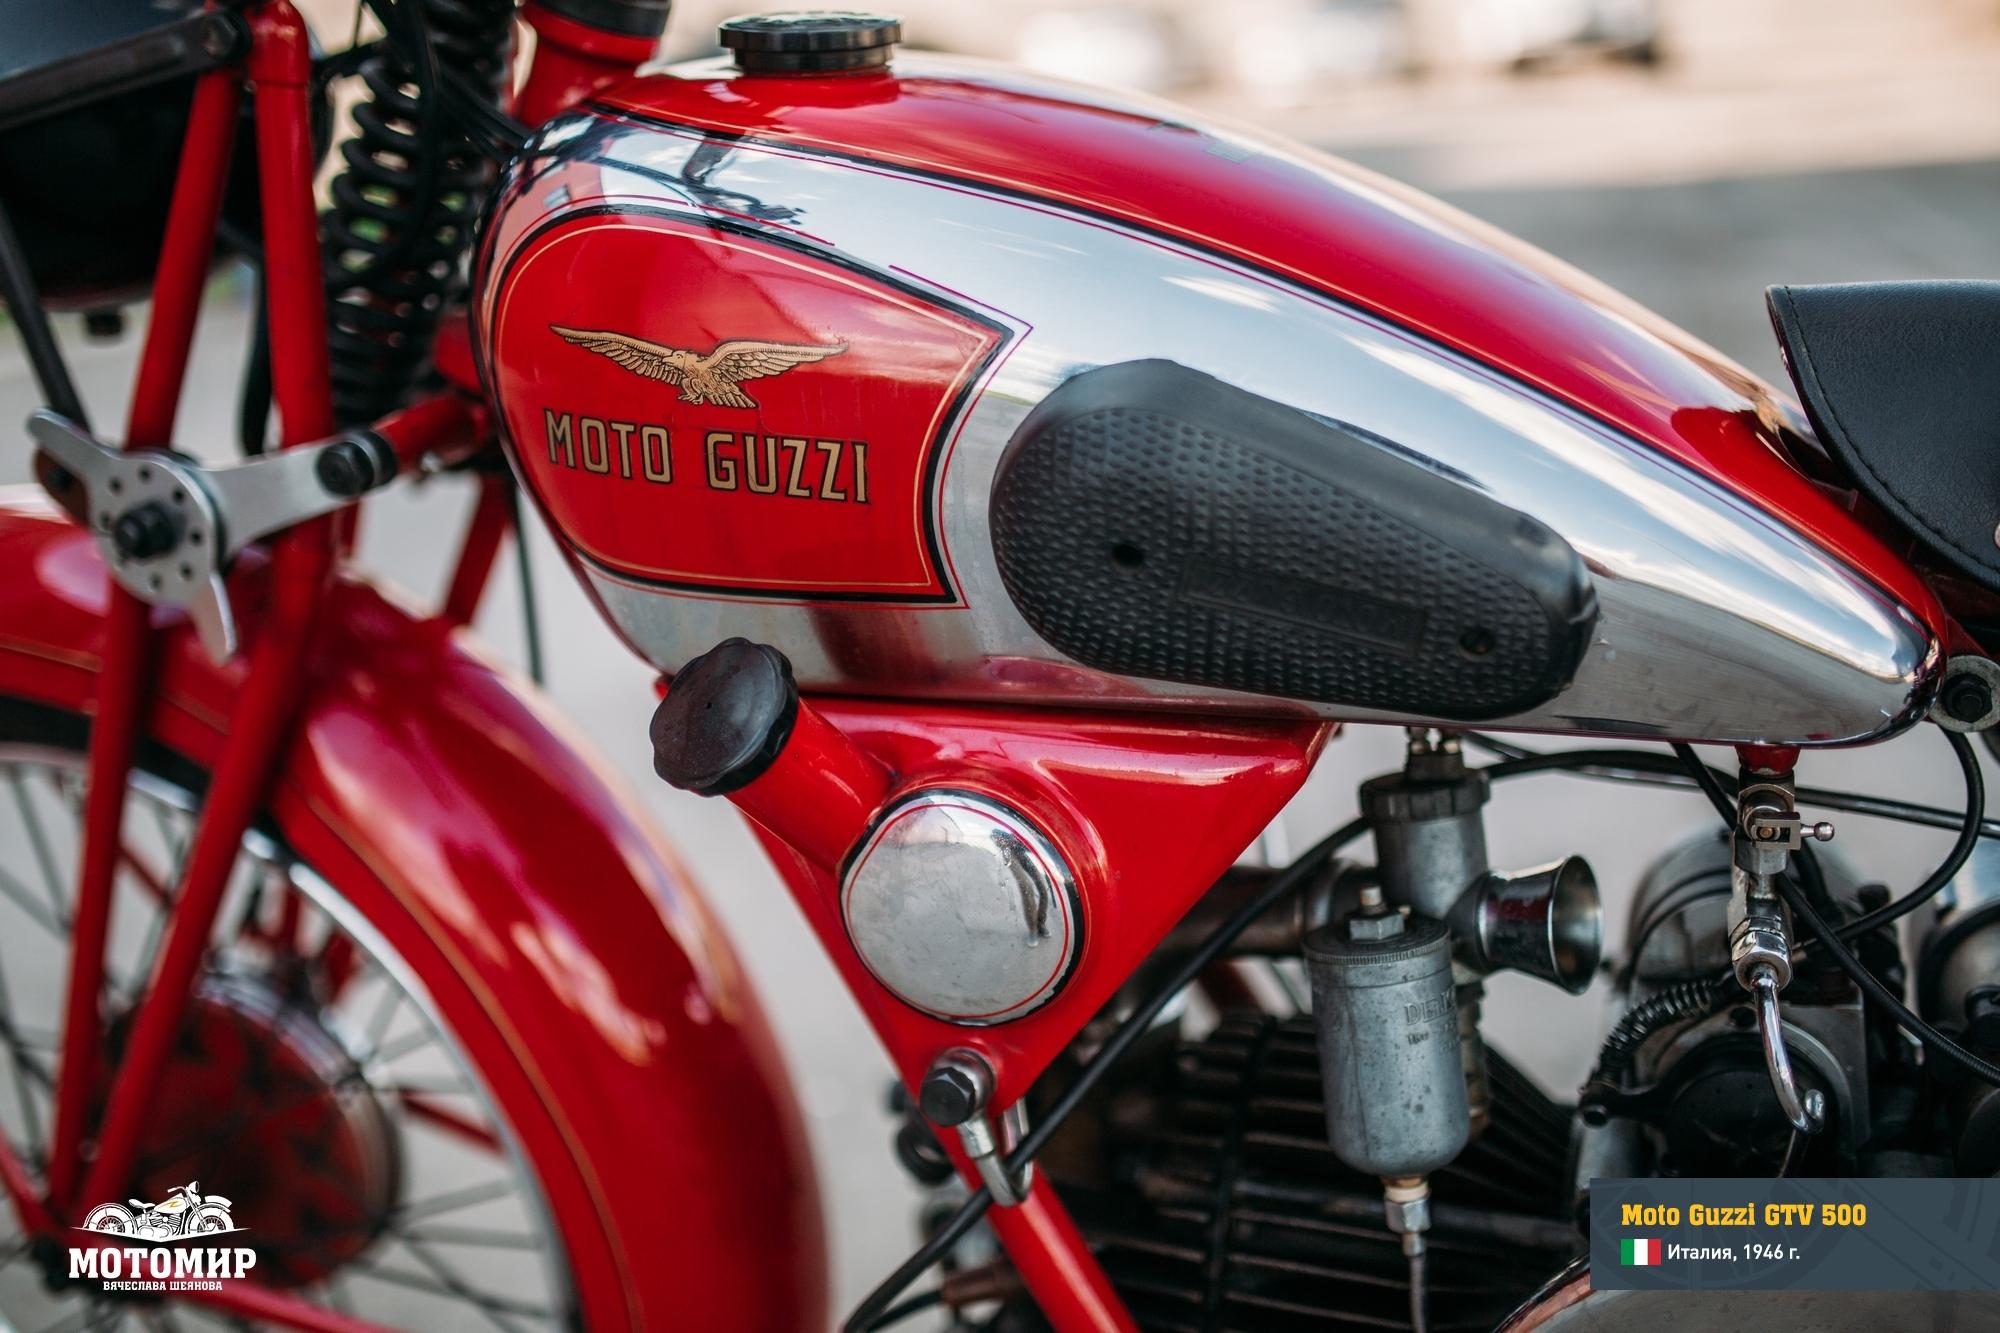 moto-guzzi-gtv-500-201509-web-28